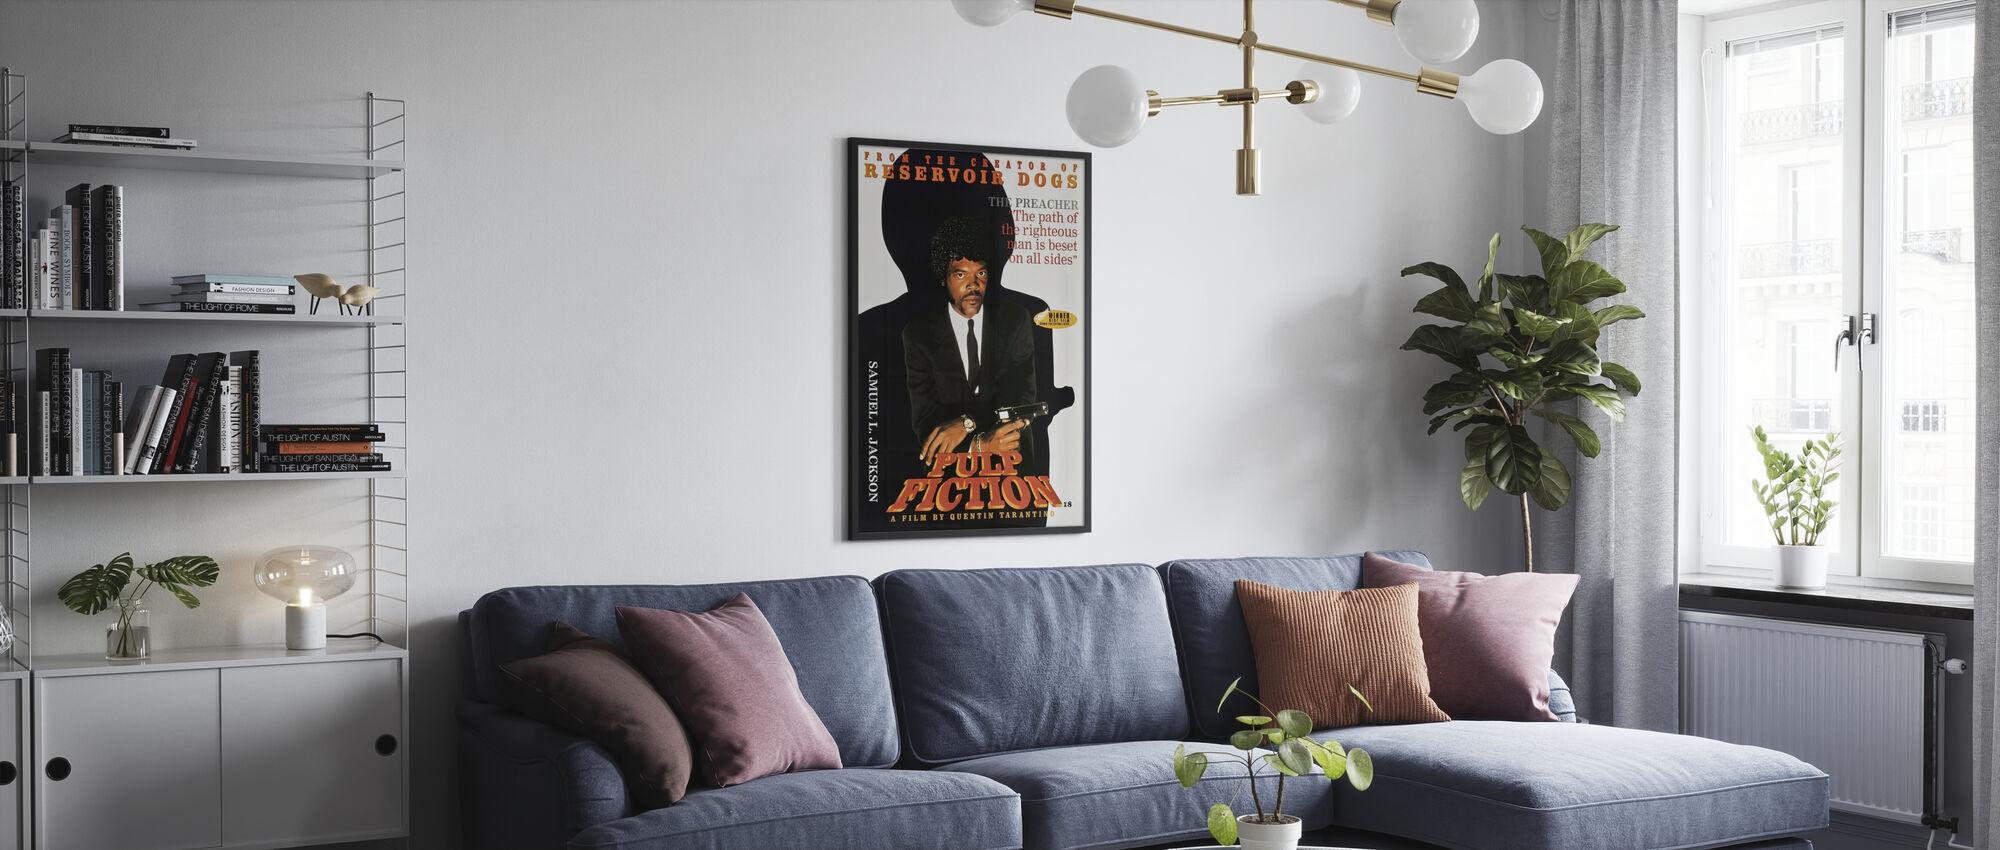 Samuel L Jackson en Pulp fictie - Poster - Woonkamer